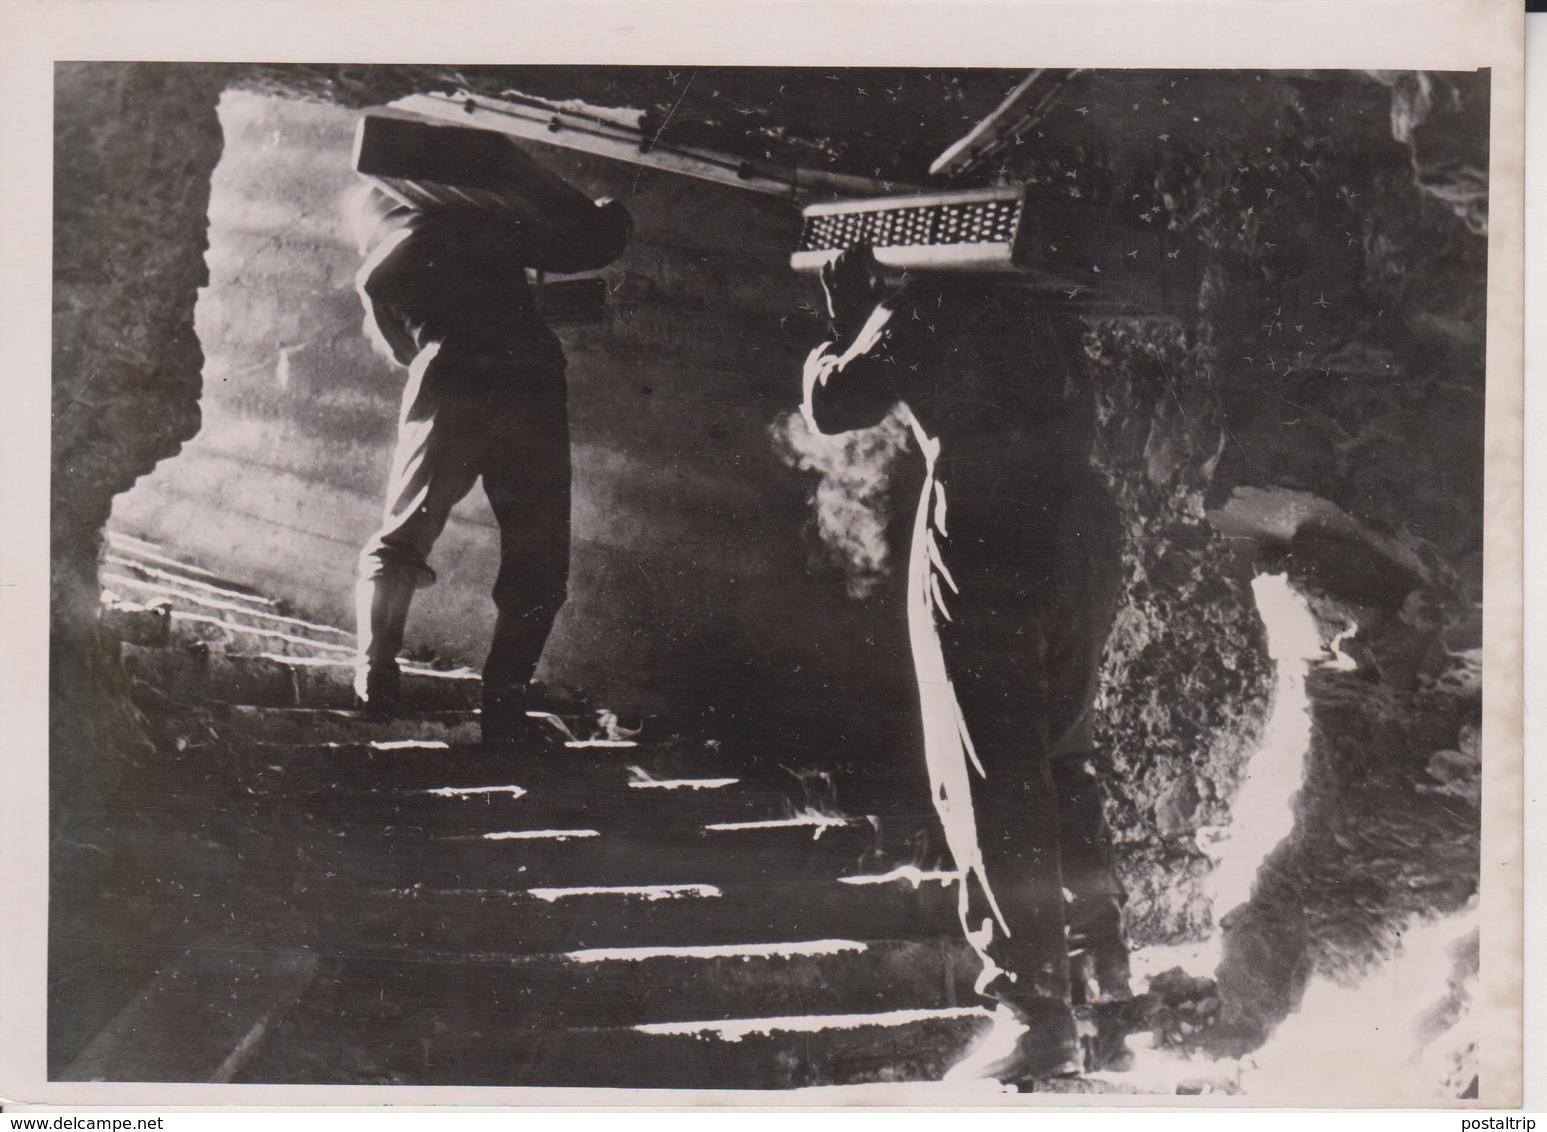 FLAK MUNITIONSBUNKER NORWEGEN  NORWAY FOTO DE PRESSE WW2 WWII WORLD WAR 2 WELTKRIEG Aleman Deutchland - Guerra, Militares